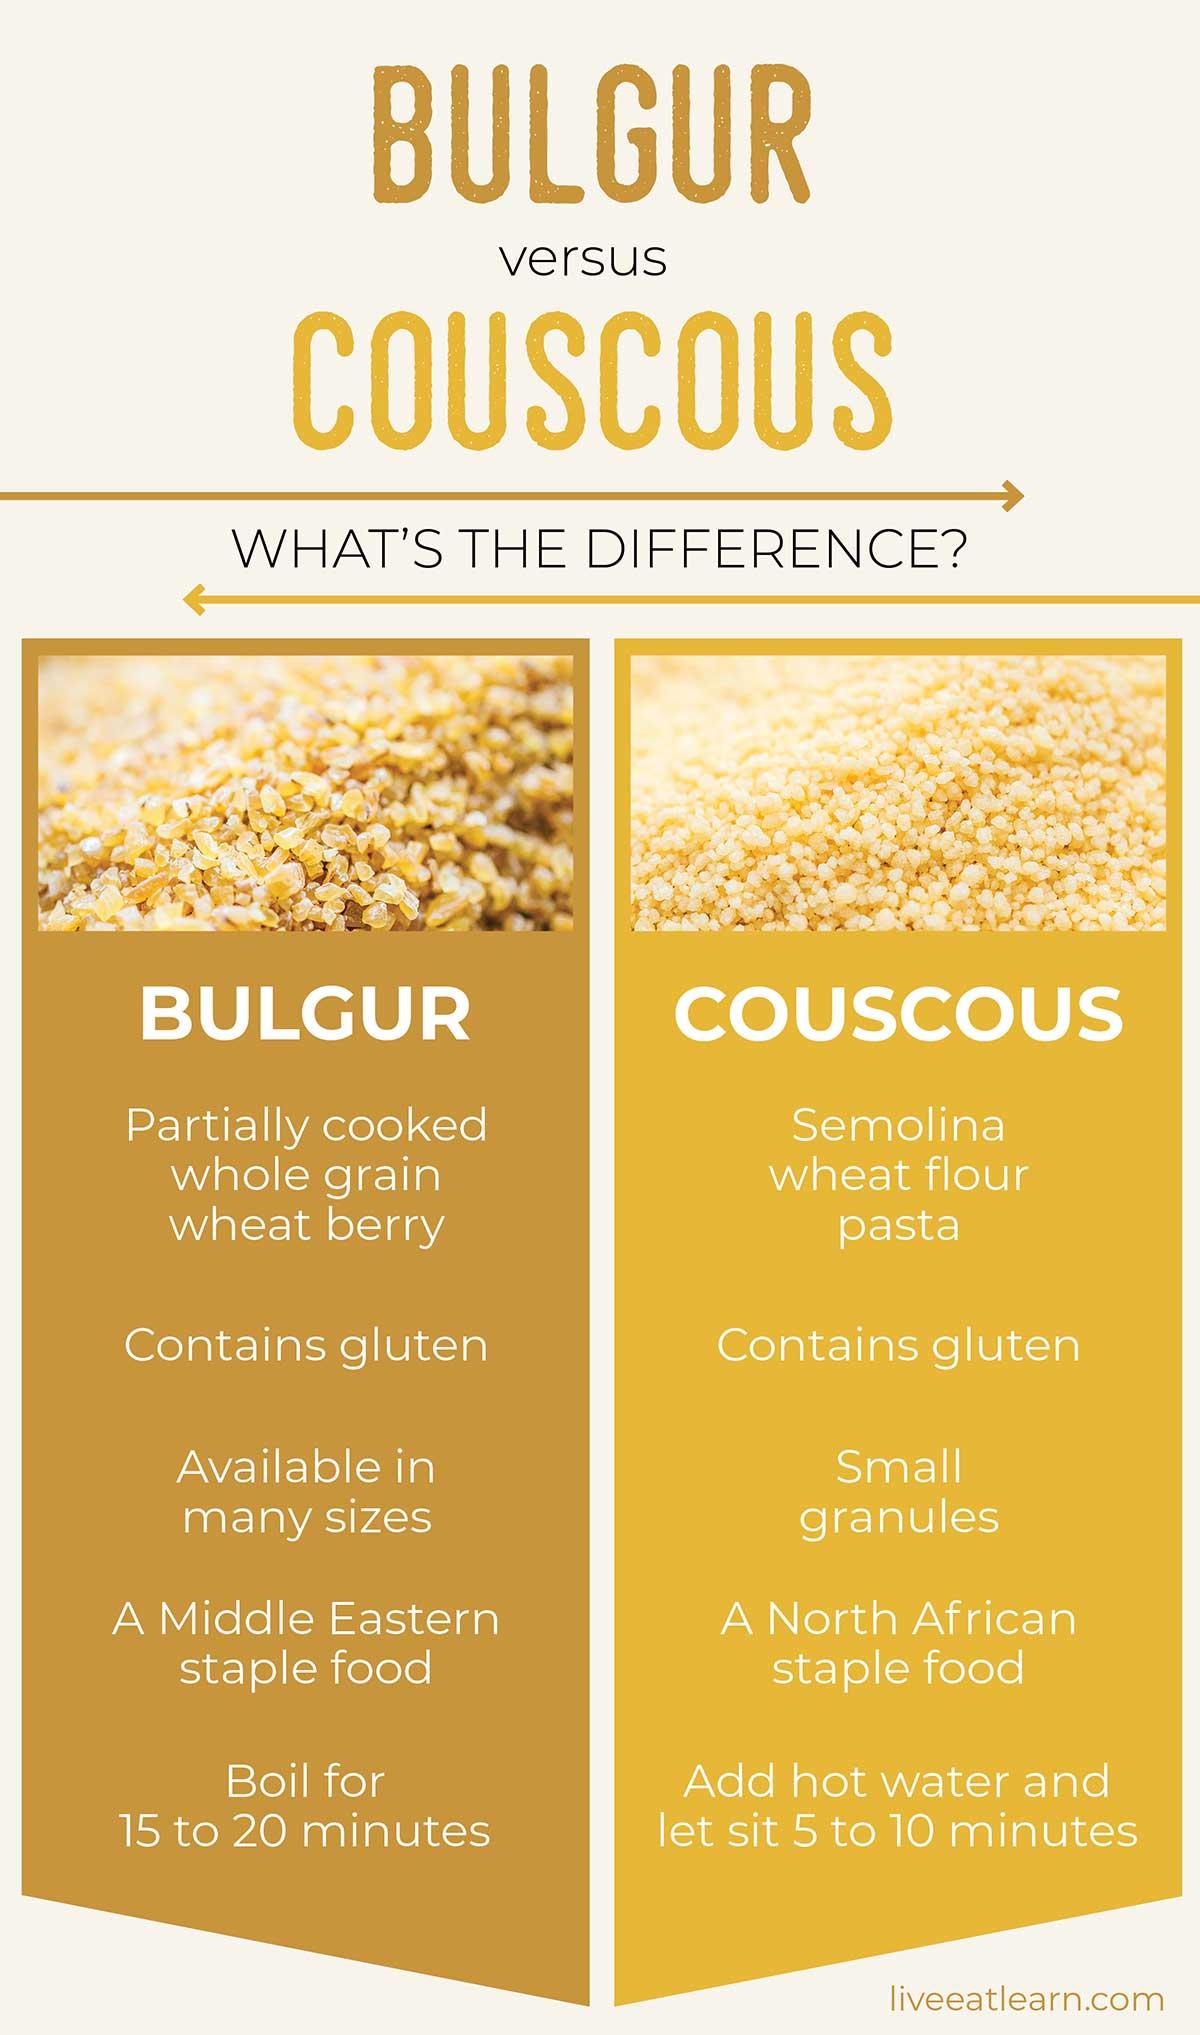 Infographic showing the differences between bulgur vs couscous